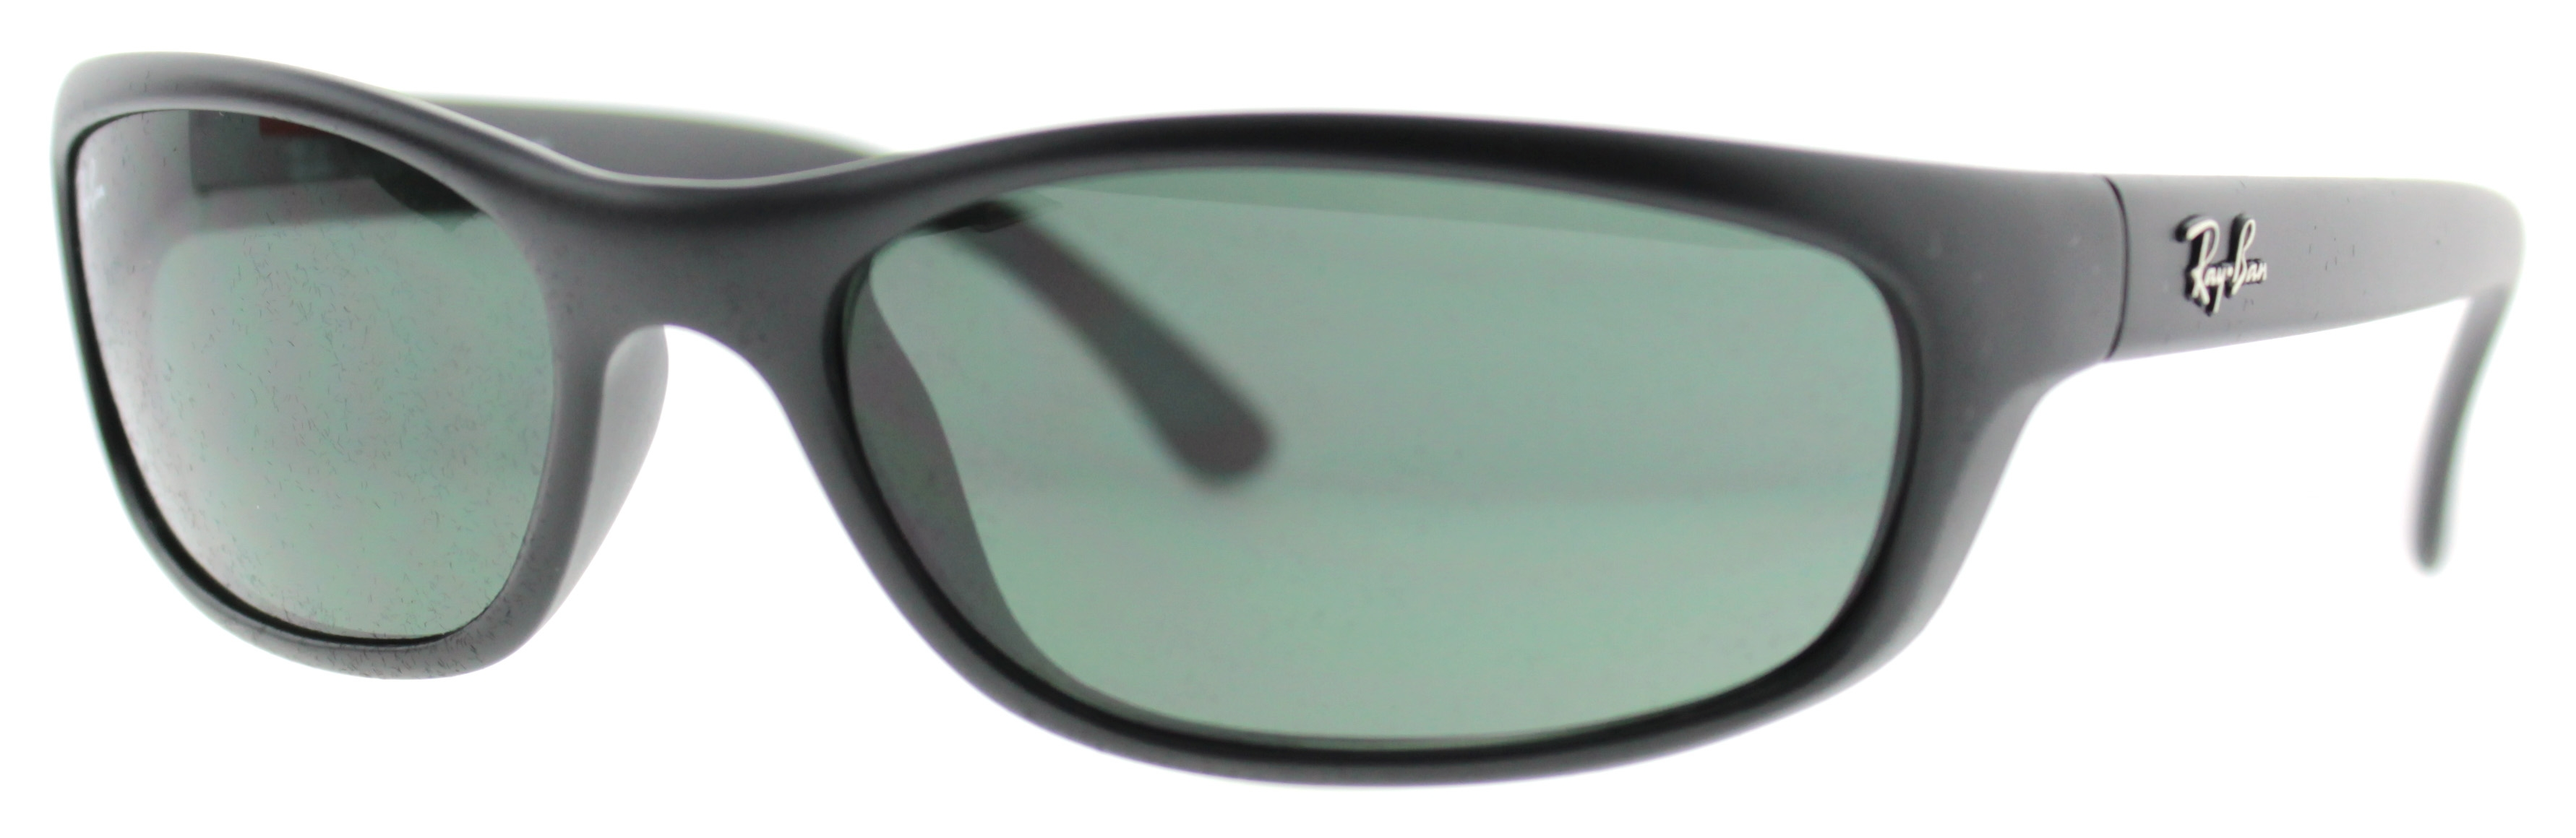 ray ban sunglasses sale uk  ray ban rb 4115 601s71